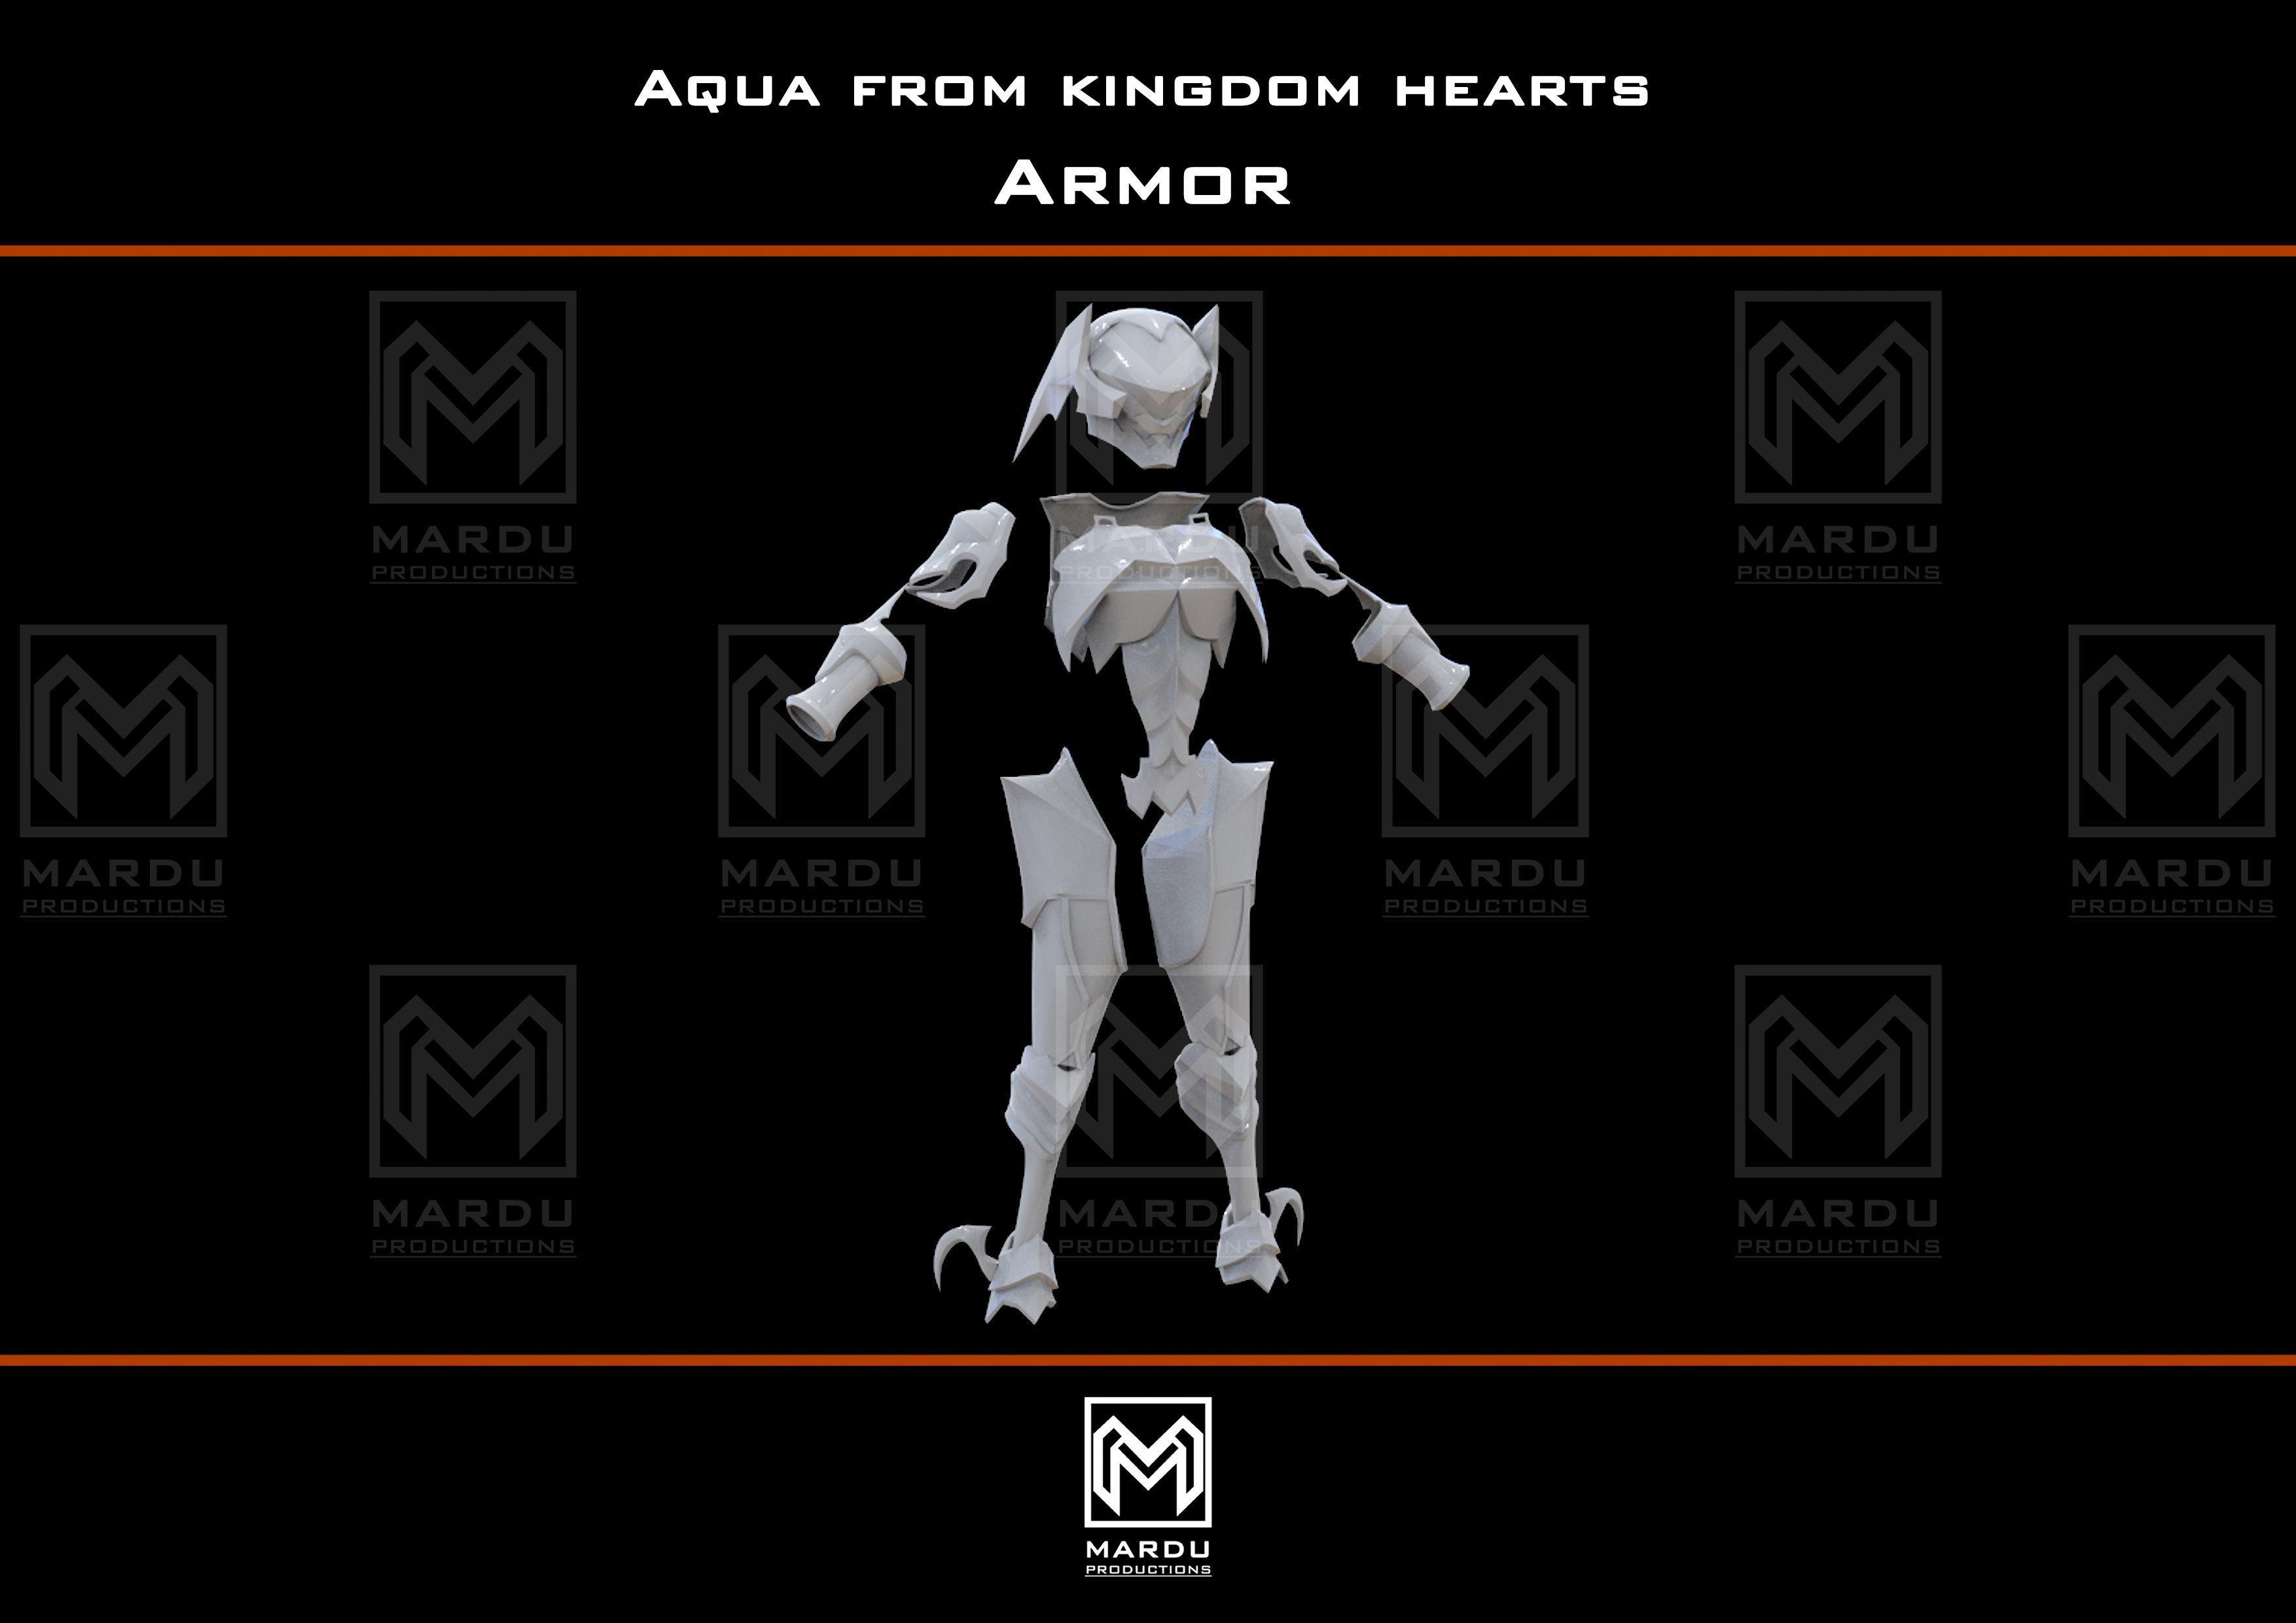 Aqua armor Kingdom Hearts